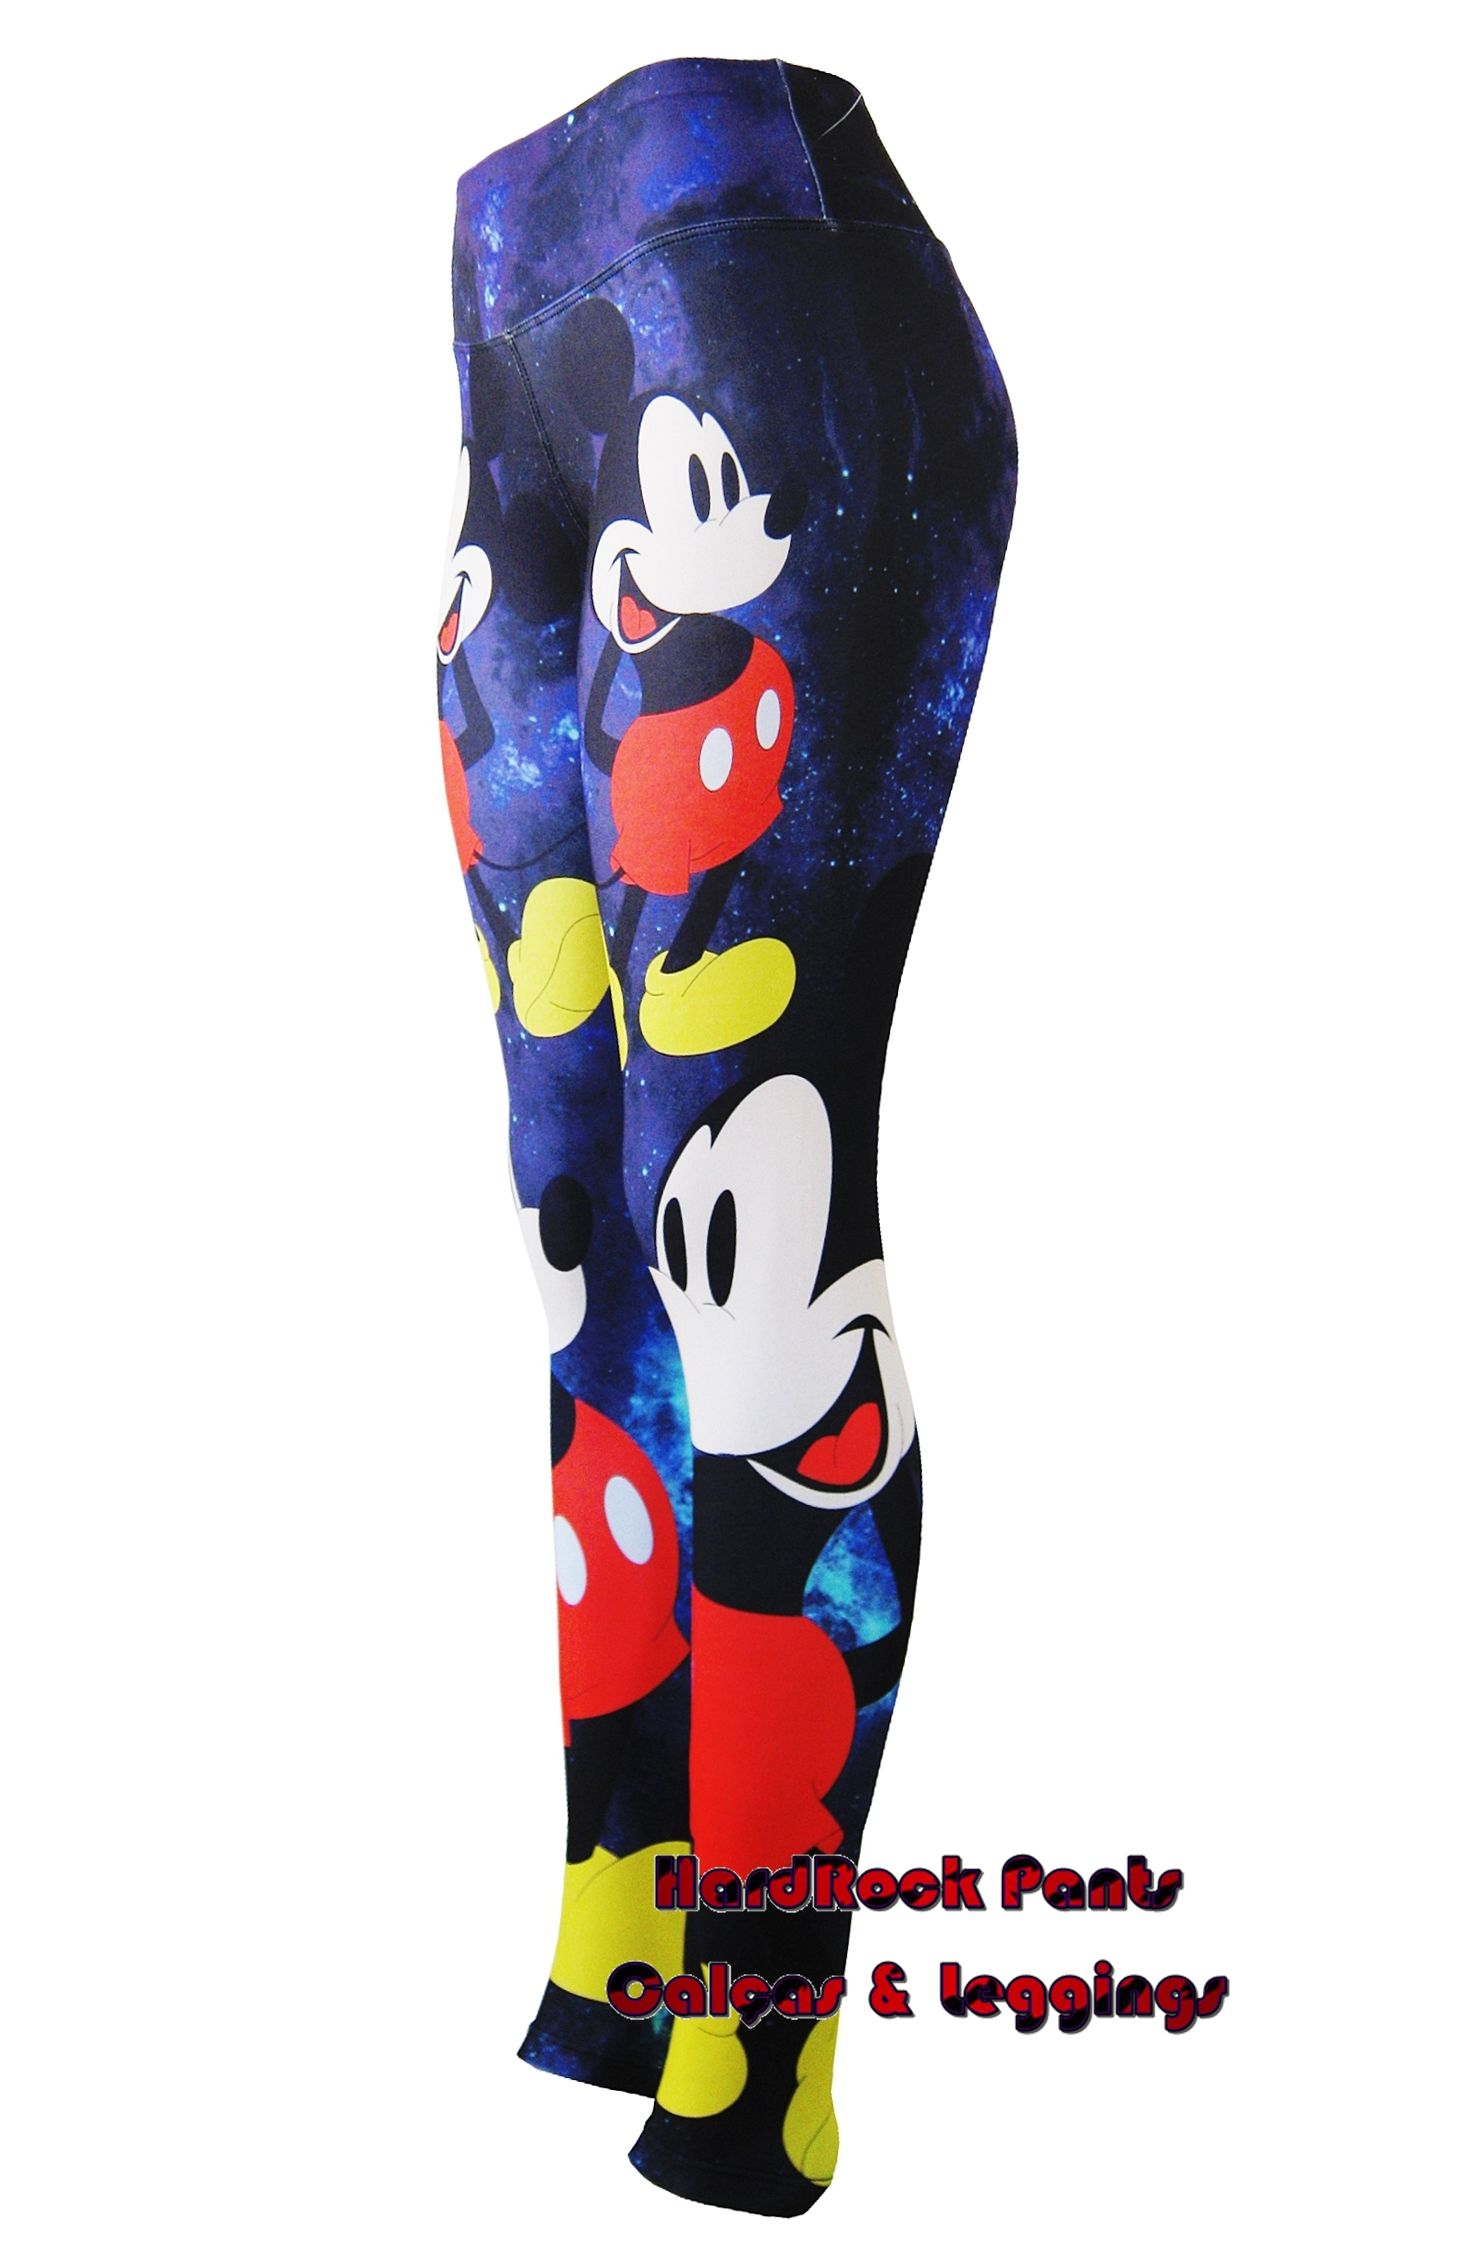 Moda Fitness · Calça Legging Estampada Coleção Disney  Mickey Mouse  calça   legging  estampada  sublimada 63b83fab419b2